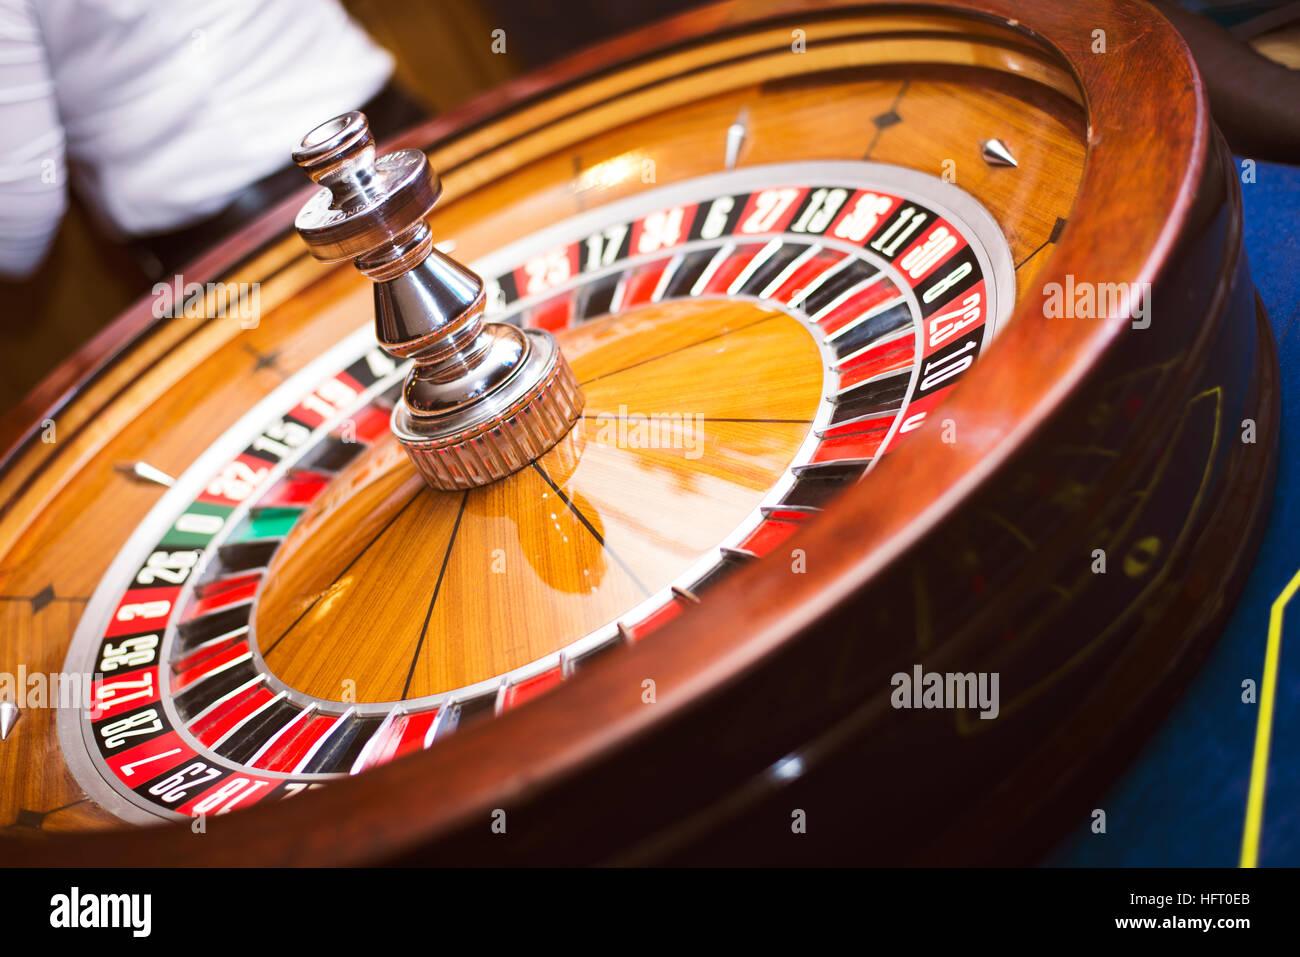 Roulette wheel in casino - Stock Image